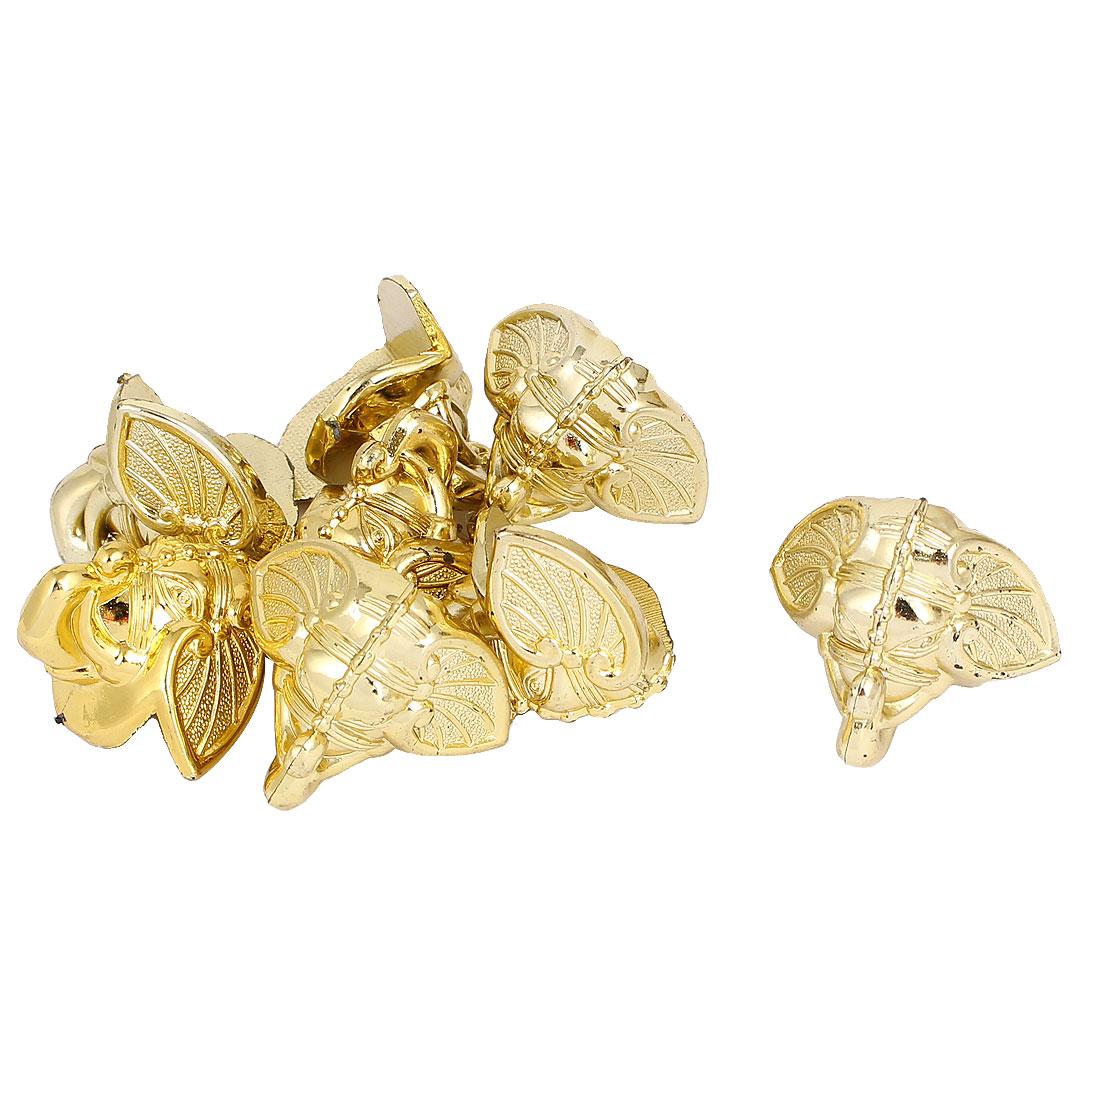 32mmx32mm Decorative Jewelry Gift Box Corner Protector Guard Gold Tone 8pcs